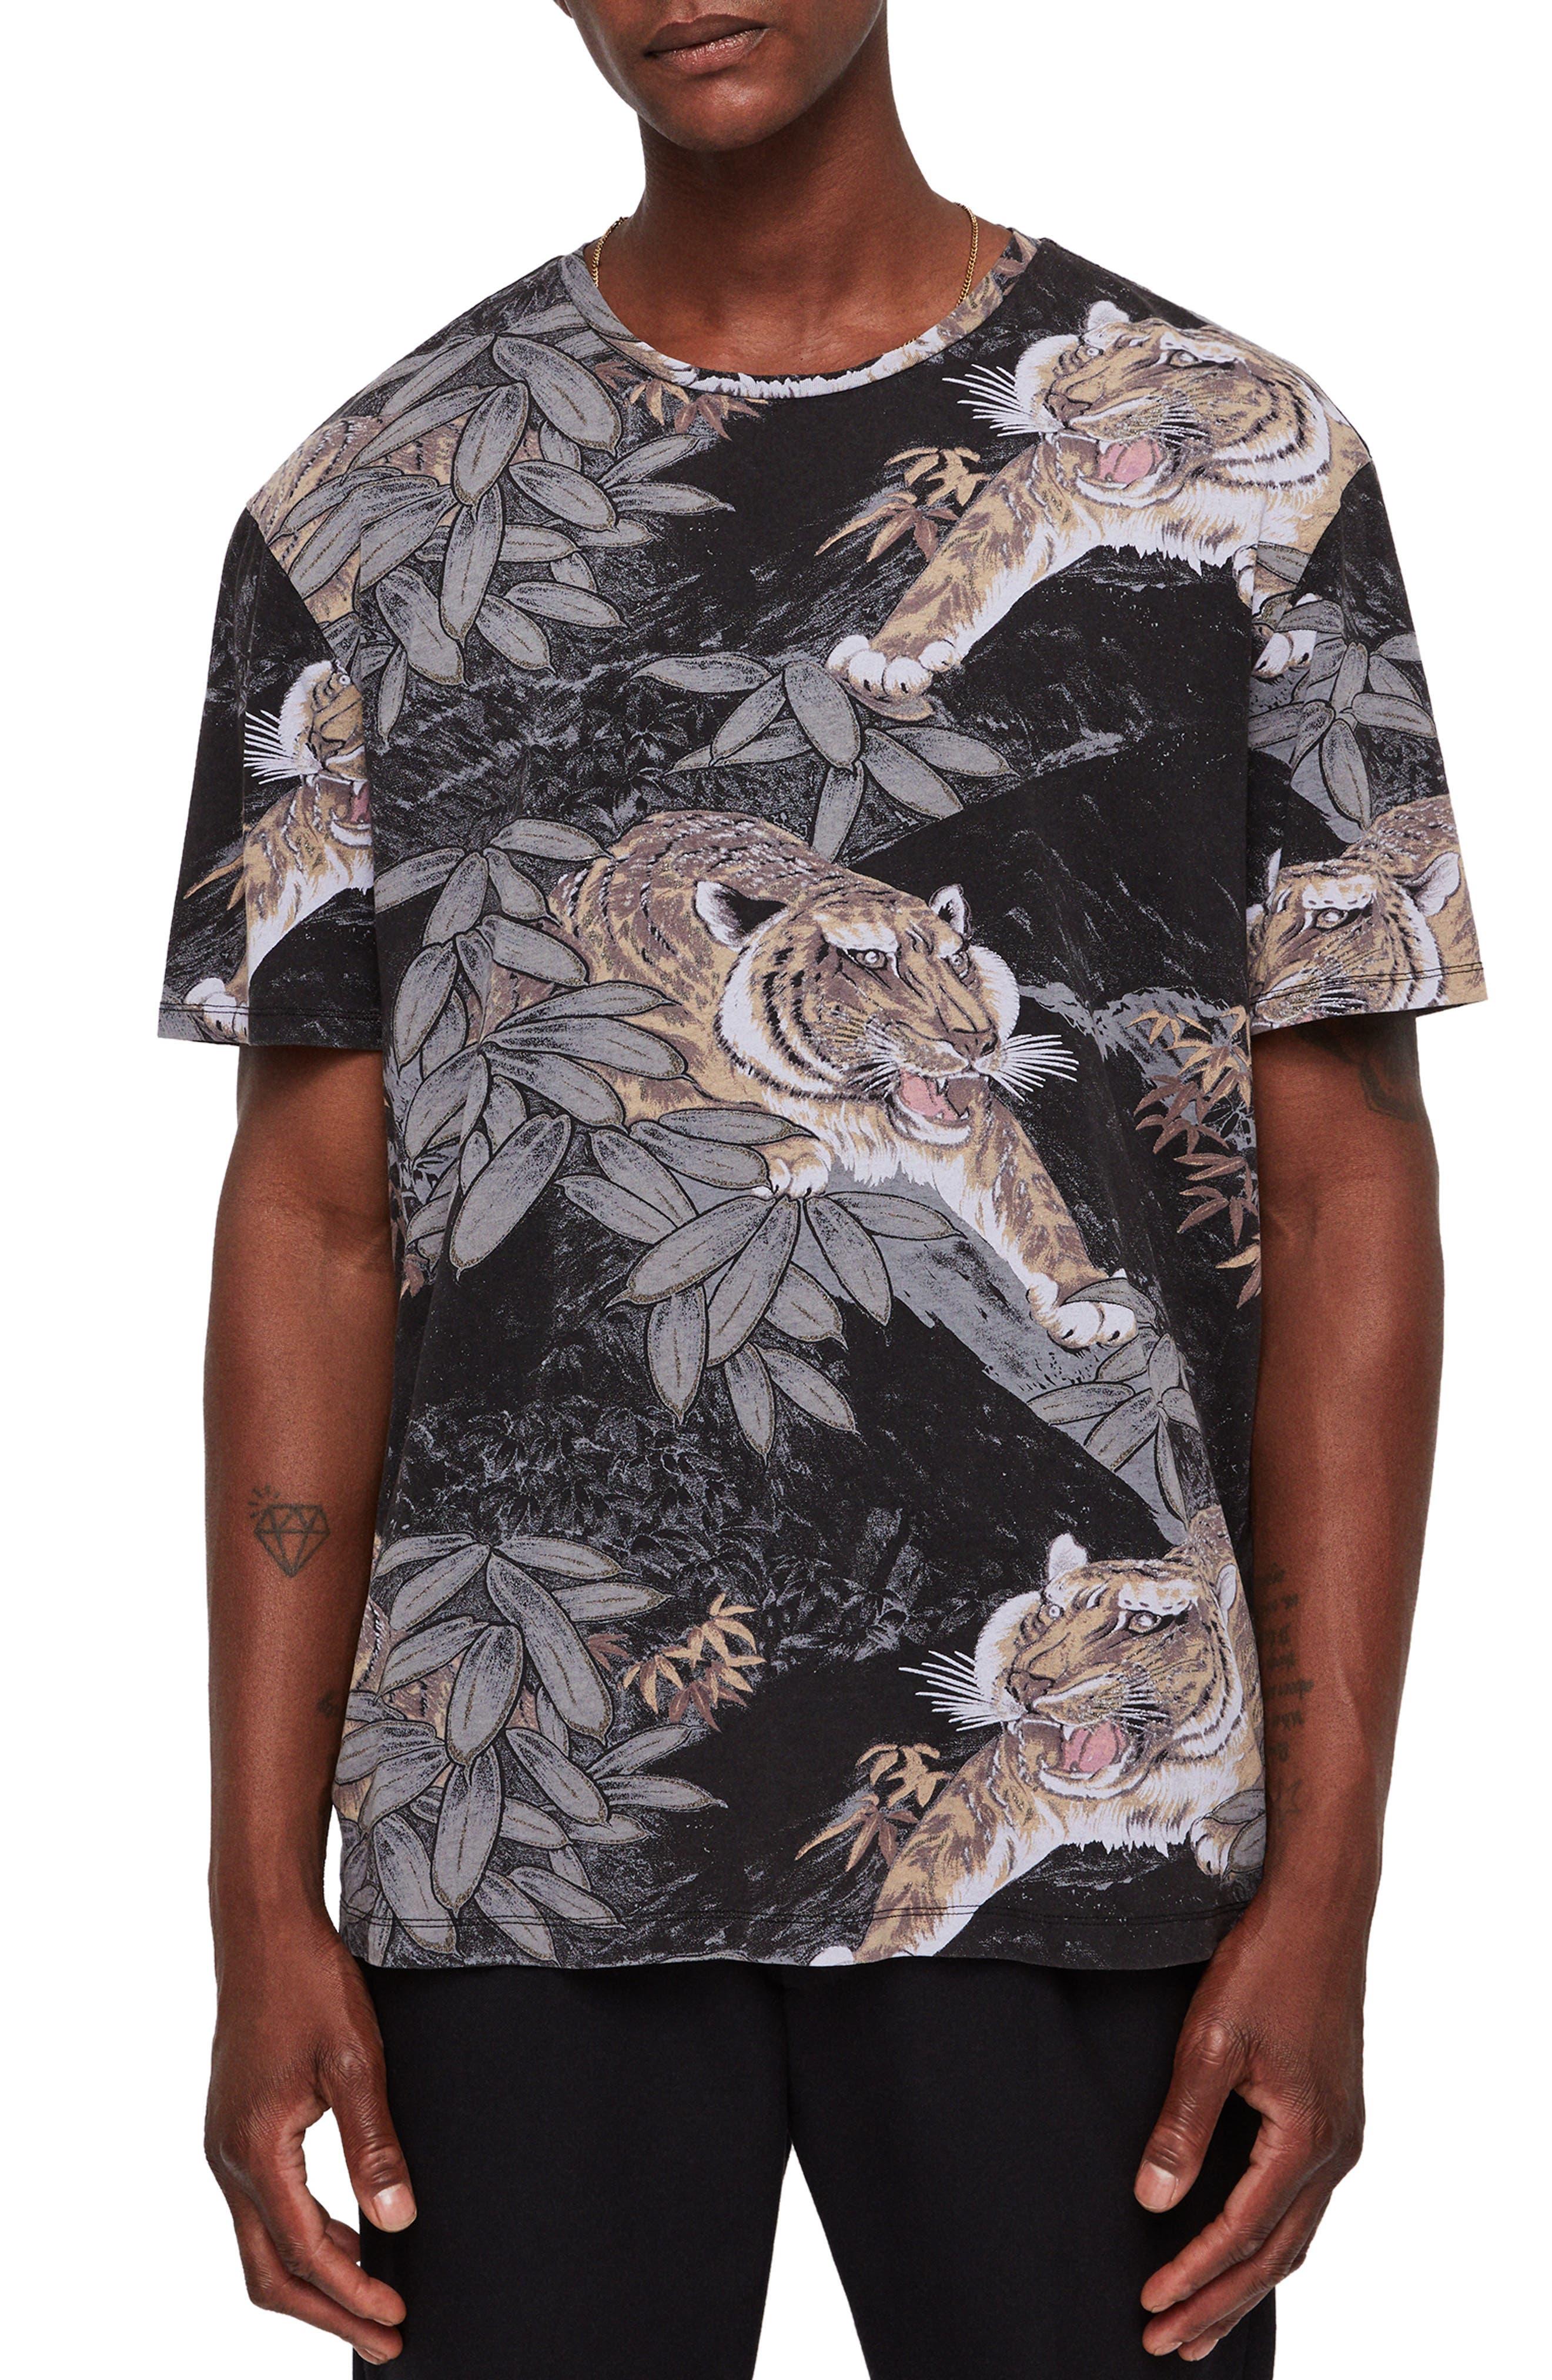 Chokai Slim Fit T-Shirt,                         Main,                         color, VINTAGE BLACK